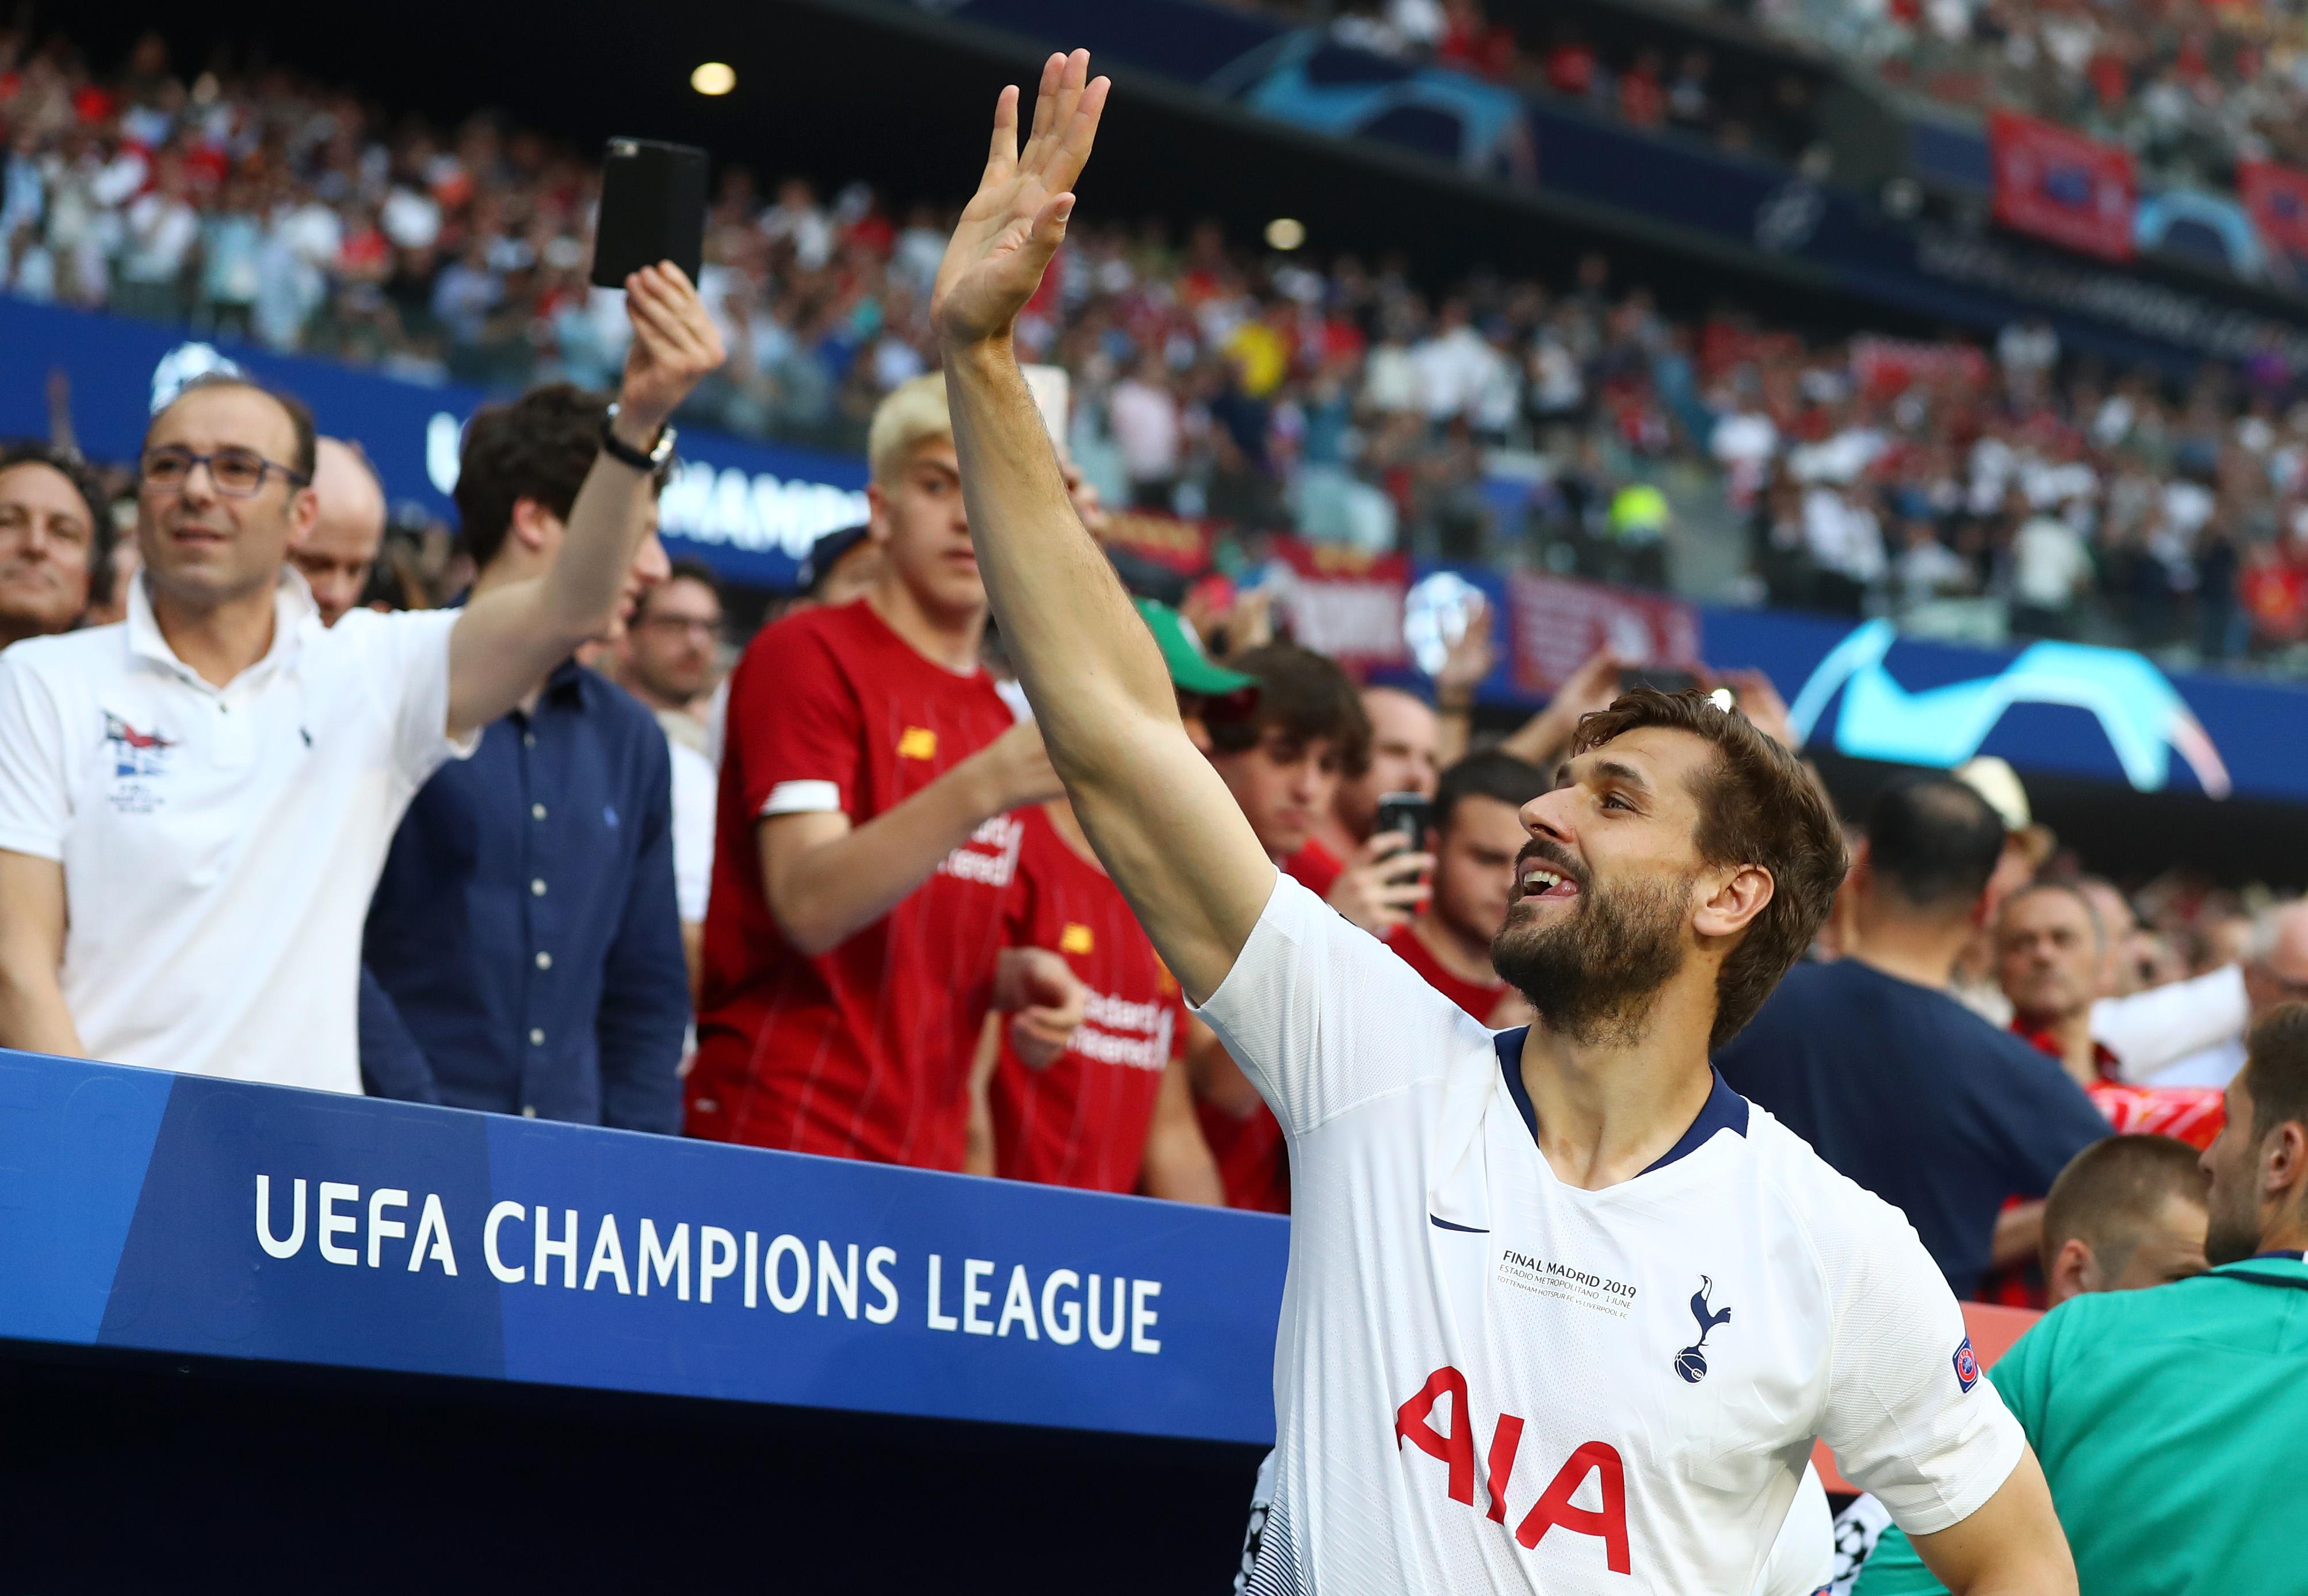 Did Tottenham just release Fernando Llorente?